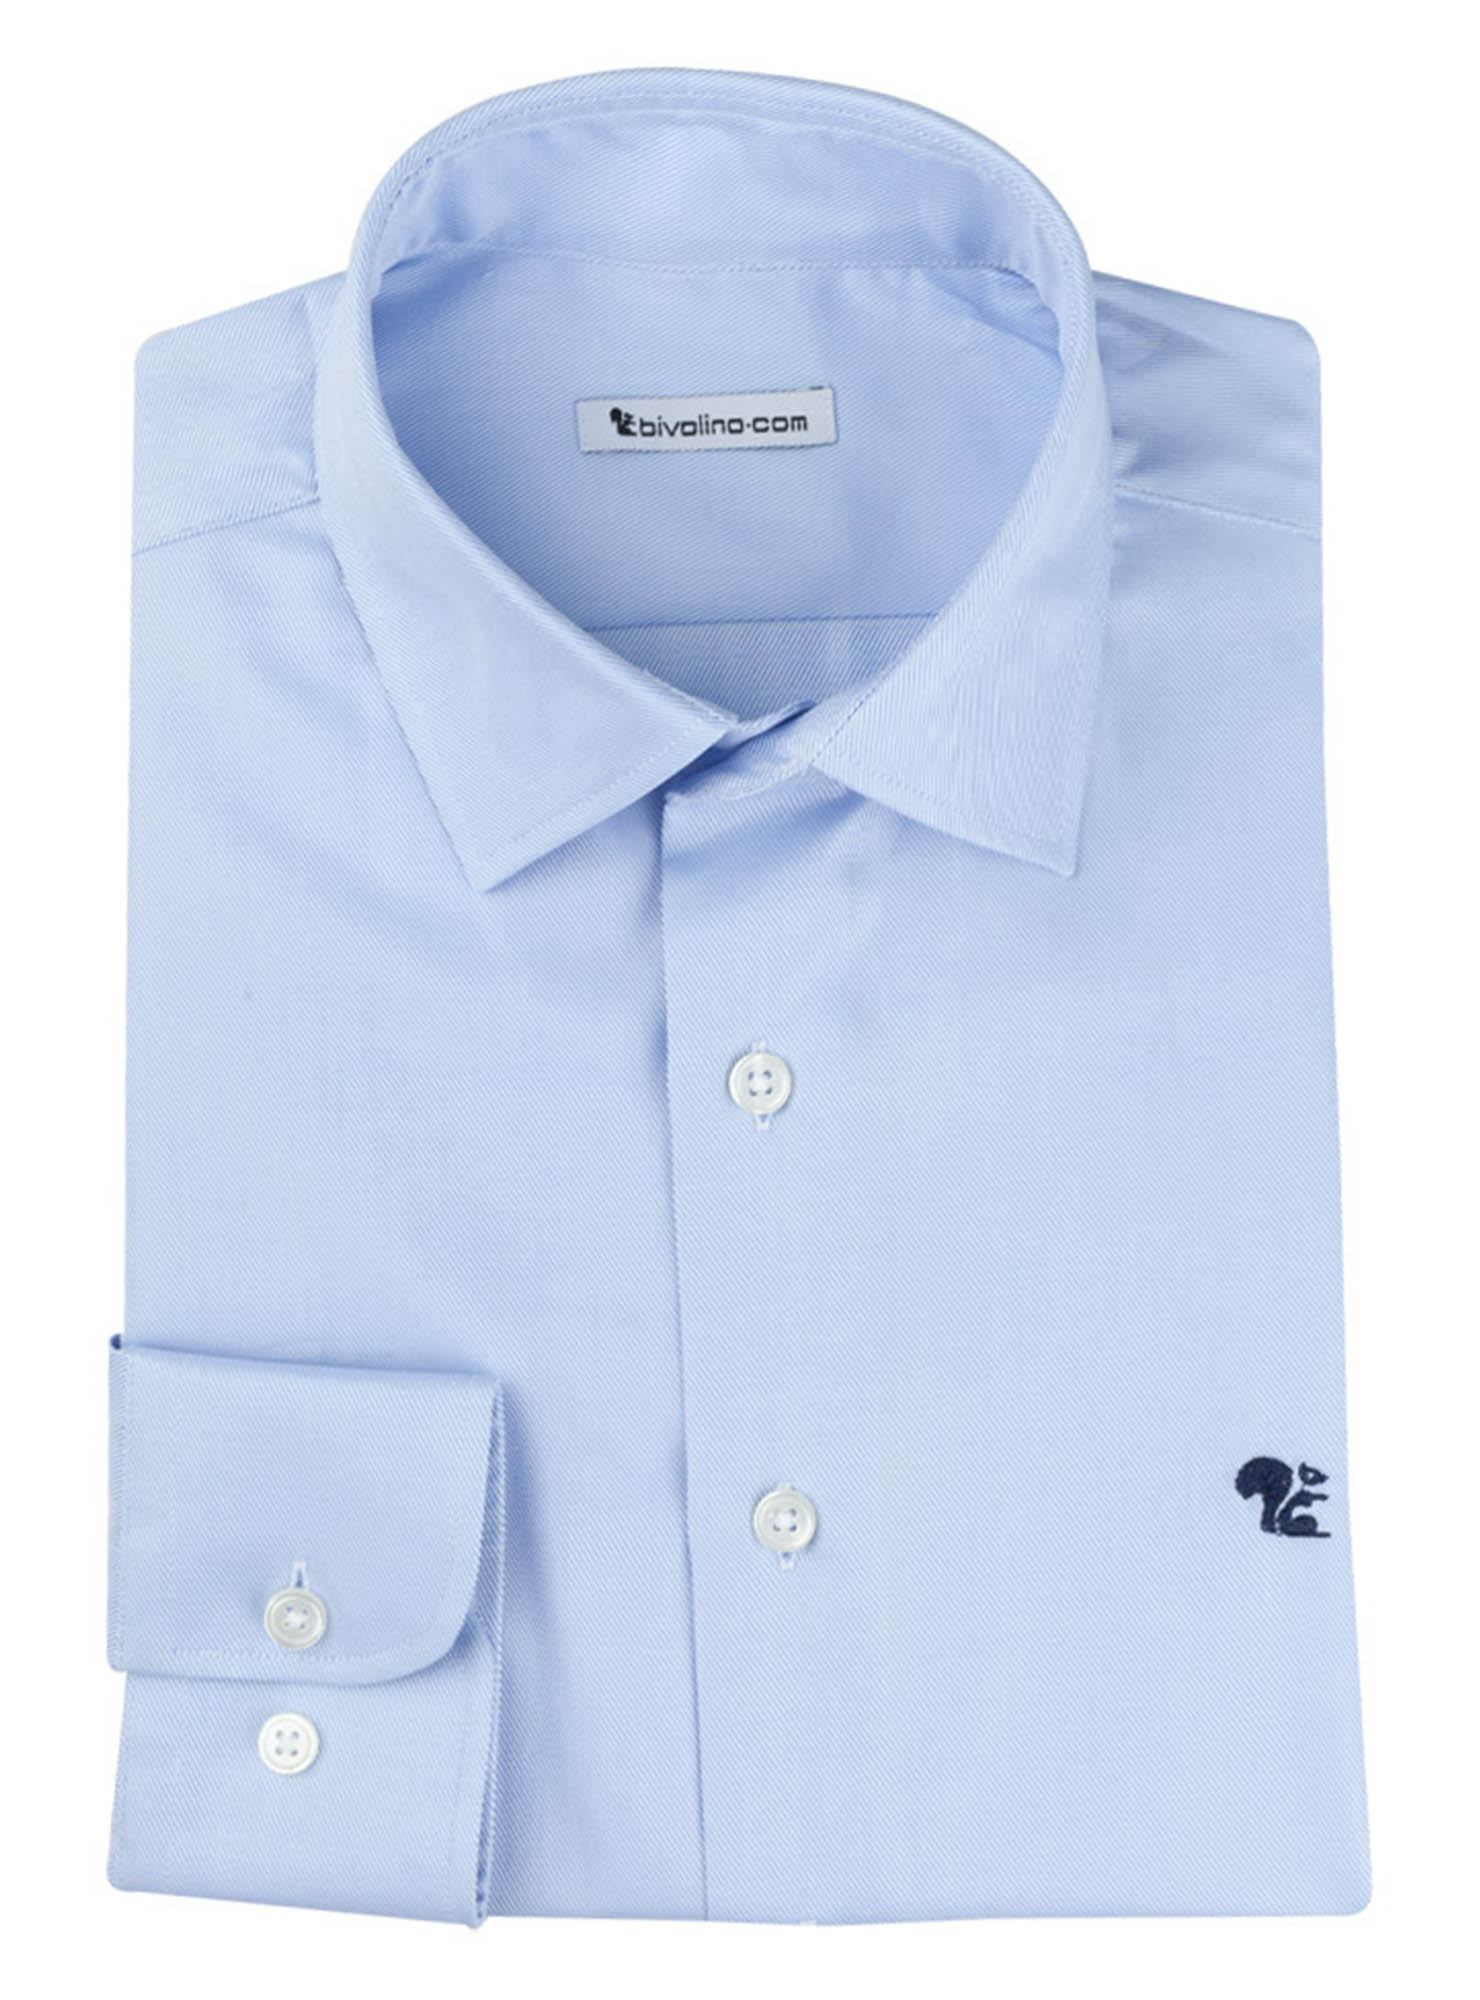 AMASENO - Men's shirt cotton 2ply DAVID and JOHN ANDERSON - ZAMBO 2